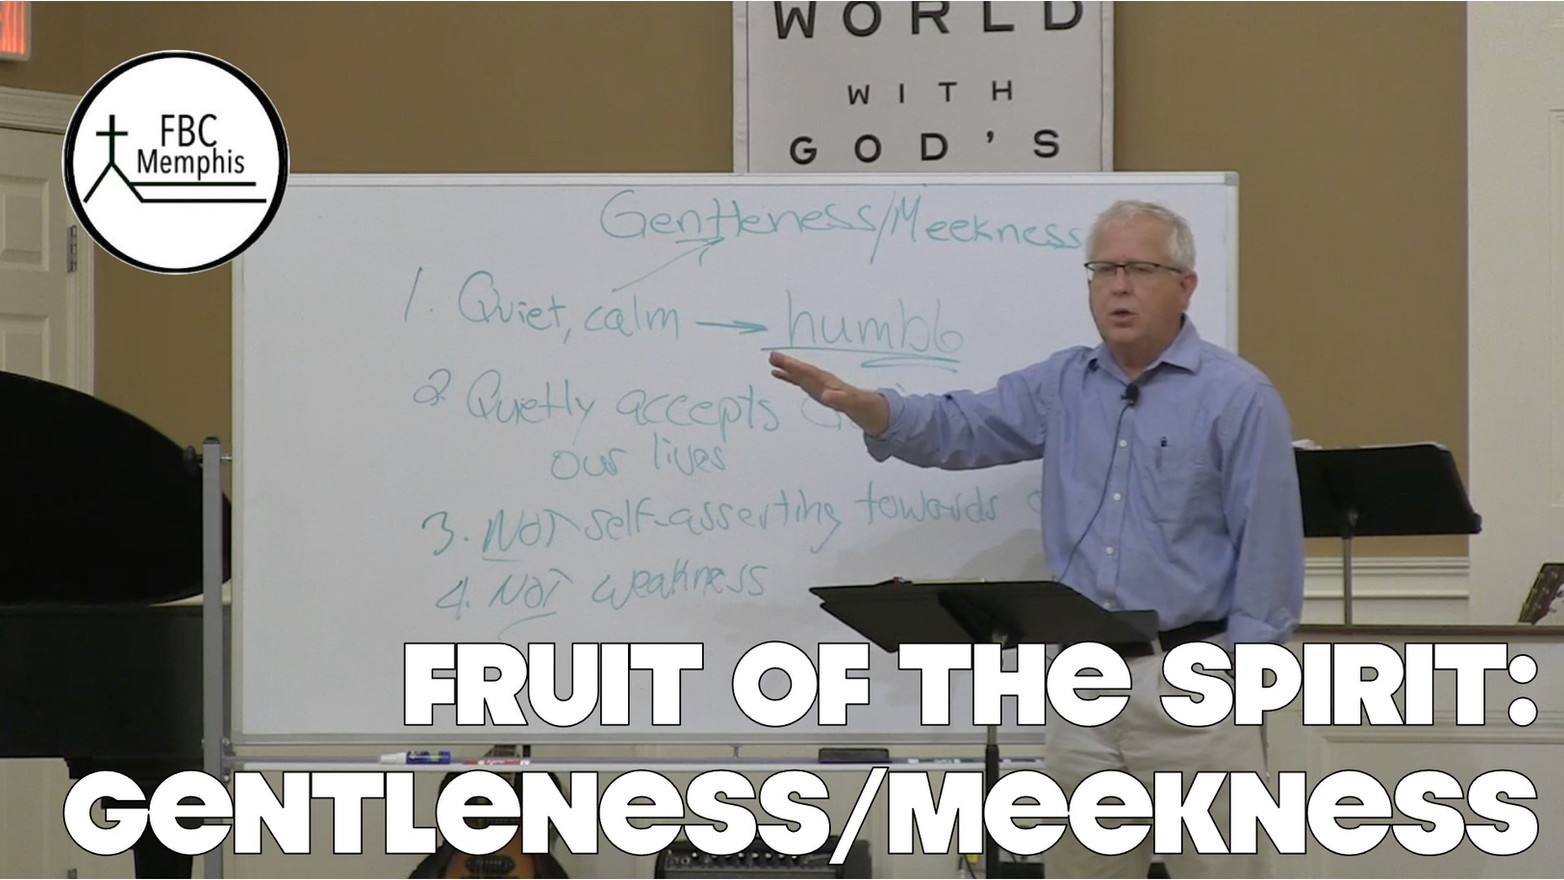 Wednesday Devotional: Fruit Of The Spirit (Gentleness/Meekness)